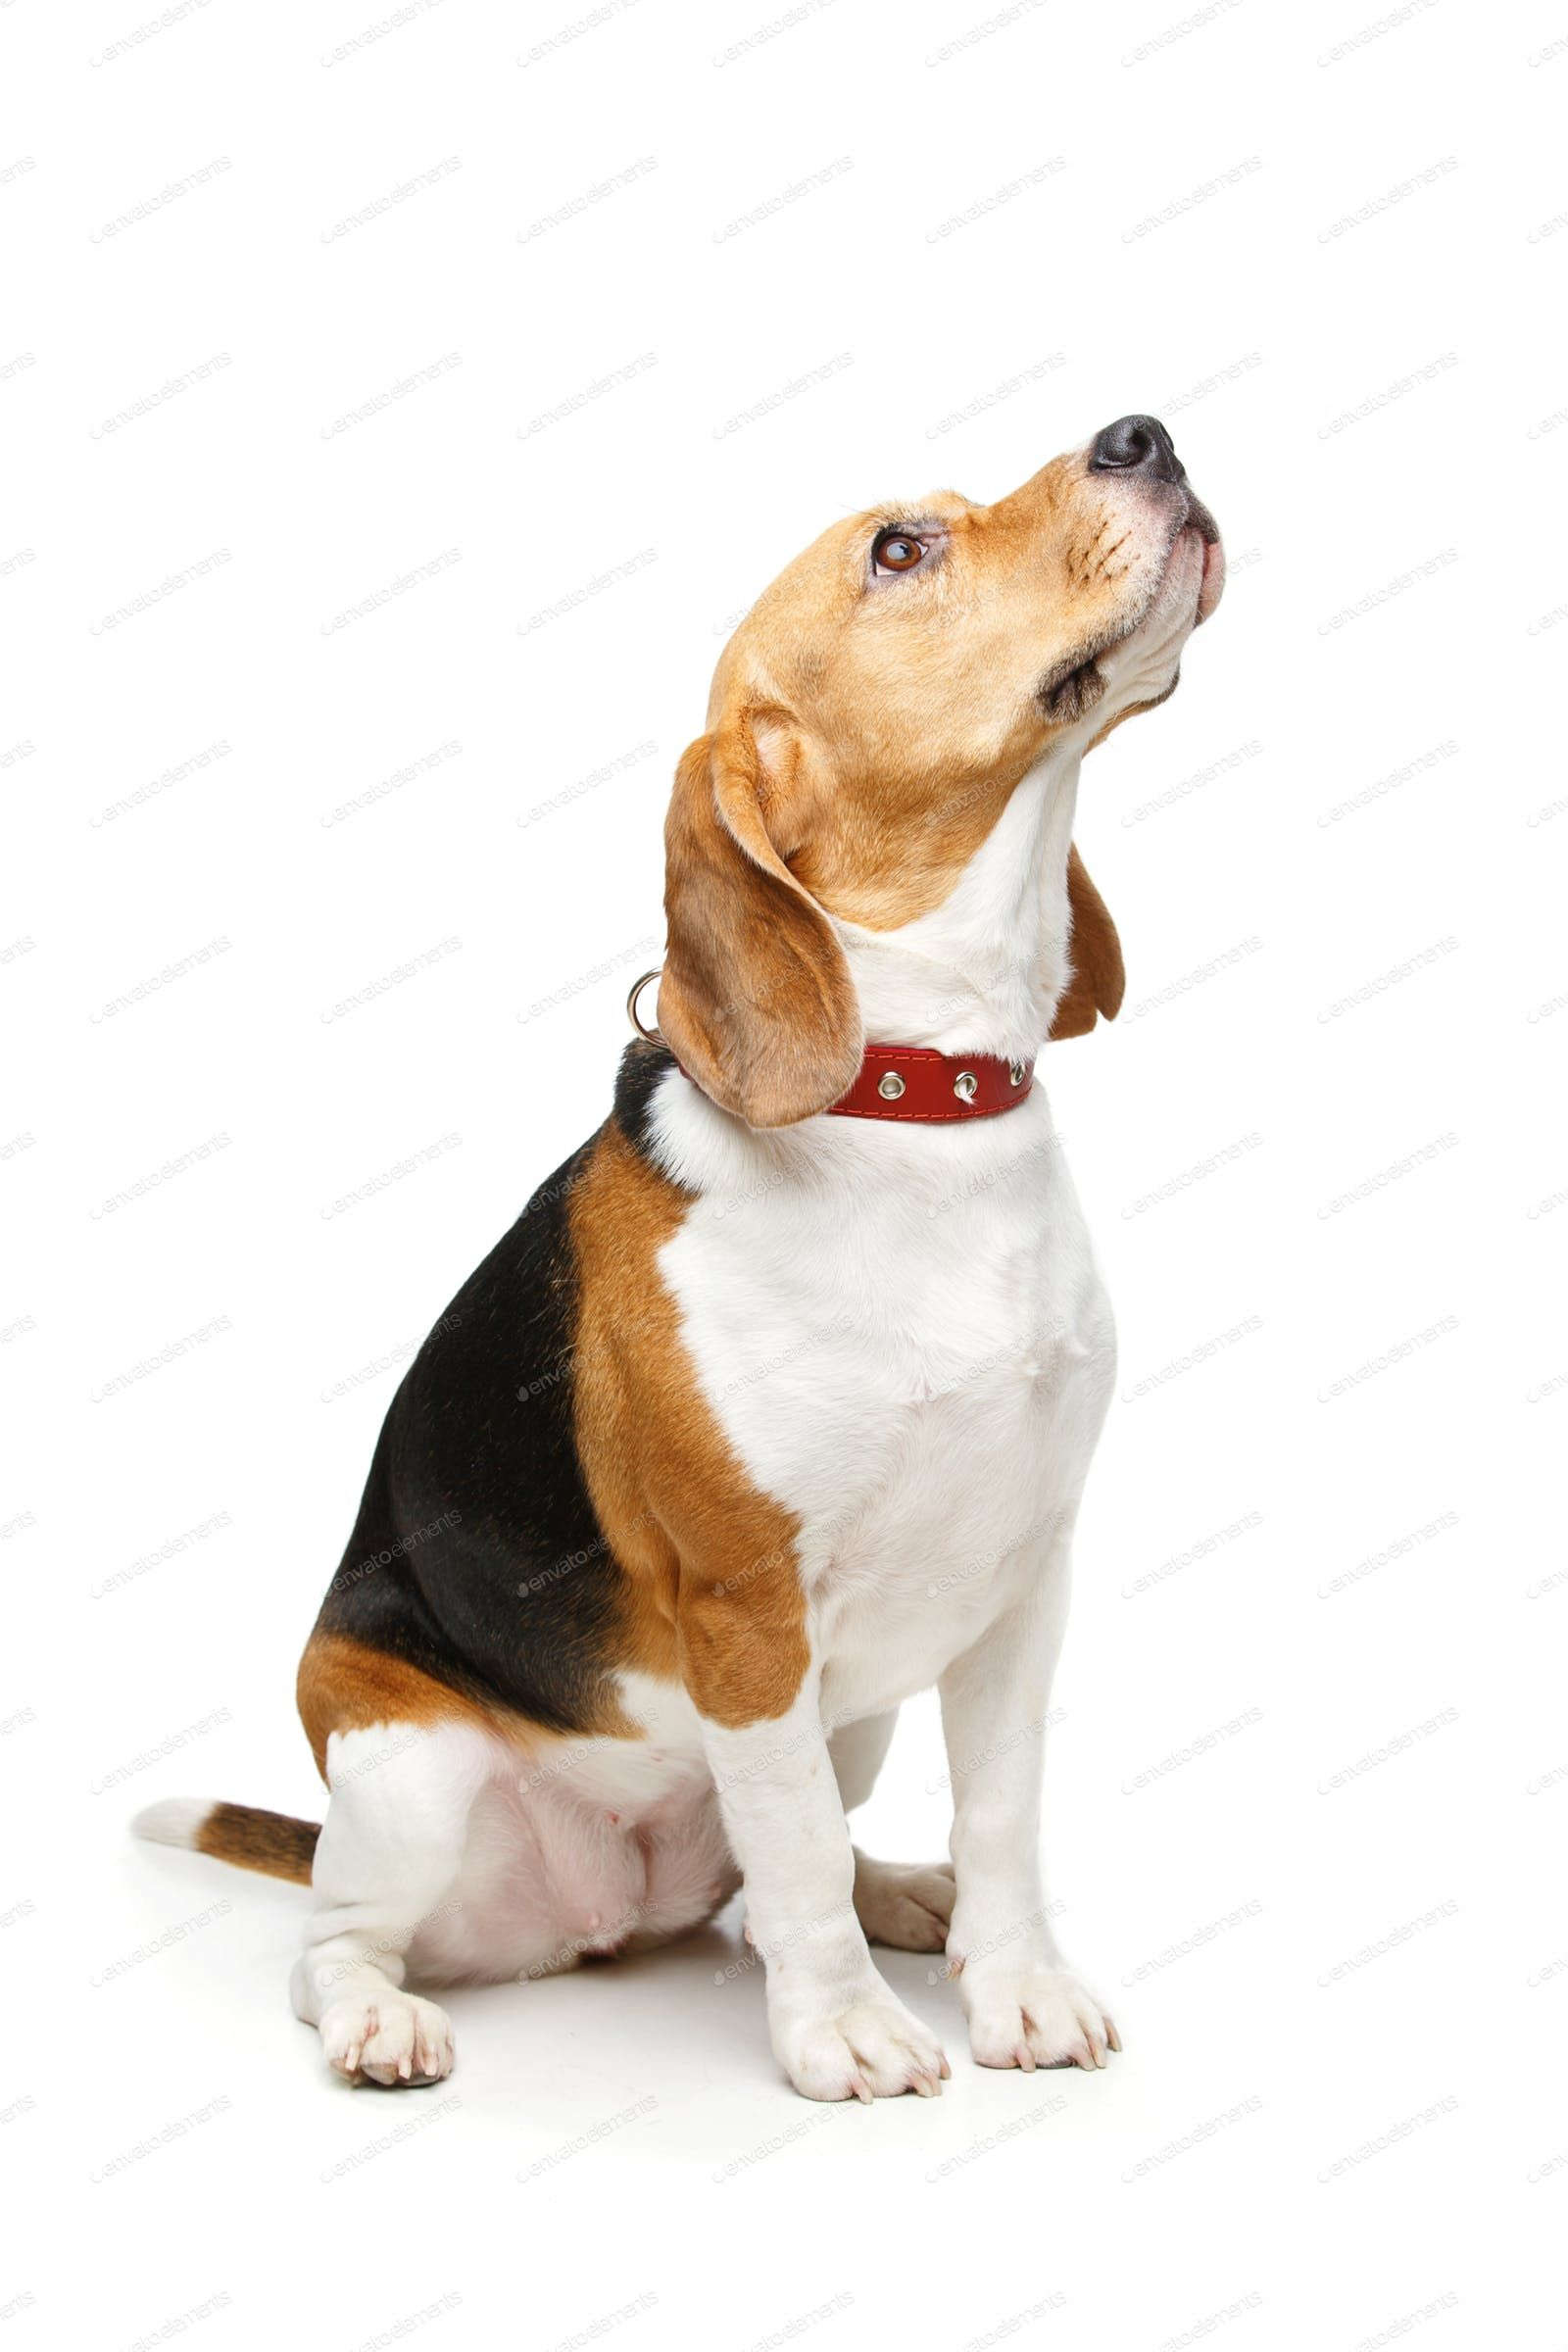 Beagle Dog Beagle Dog For Sale Beagles For Sale Online Beagle Female For Sale Puppies For Sale Uk Pocket Beagle For Sale Beagle Beagle Dog Beagle Puppy Beagle